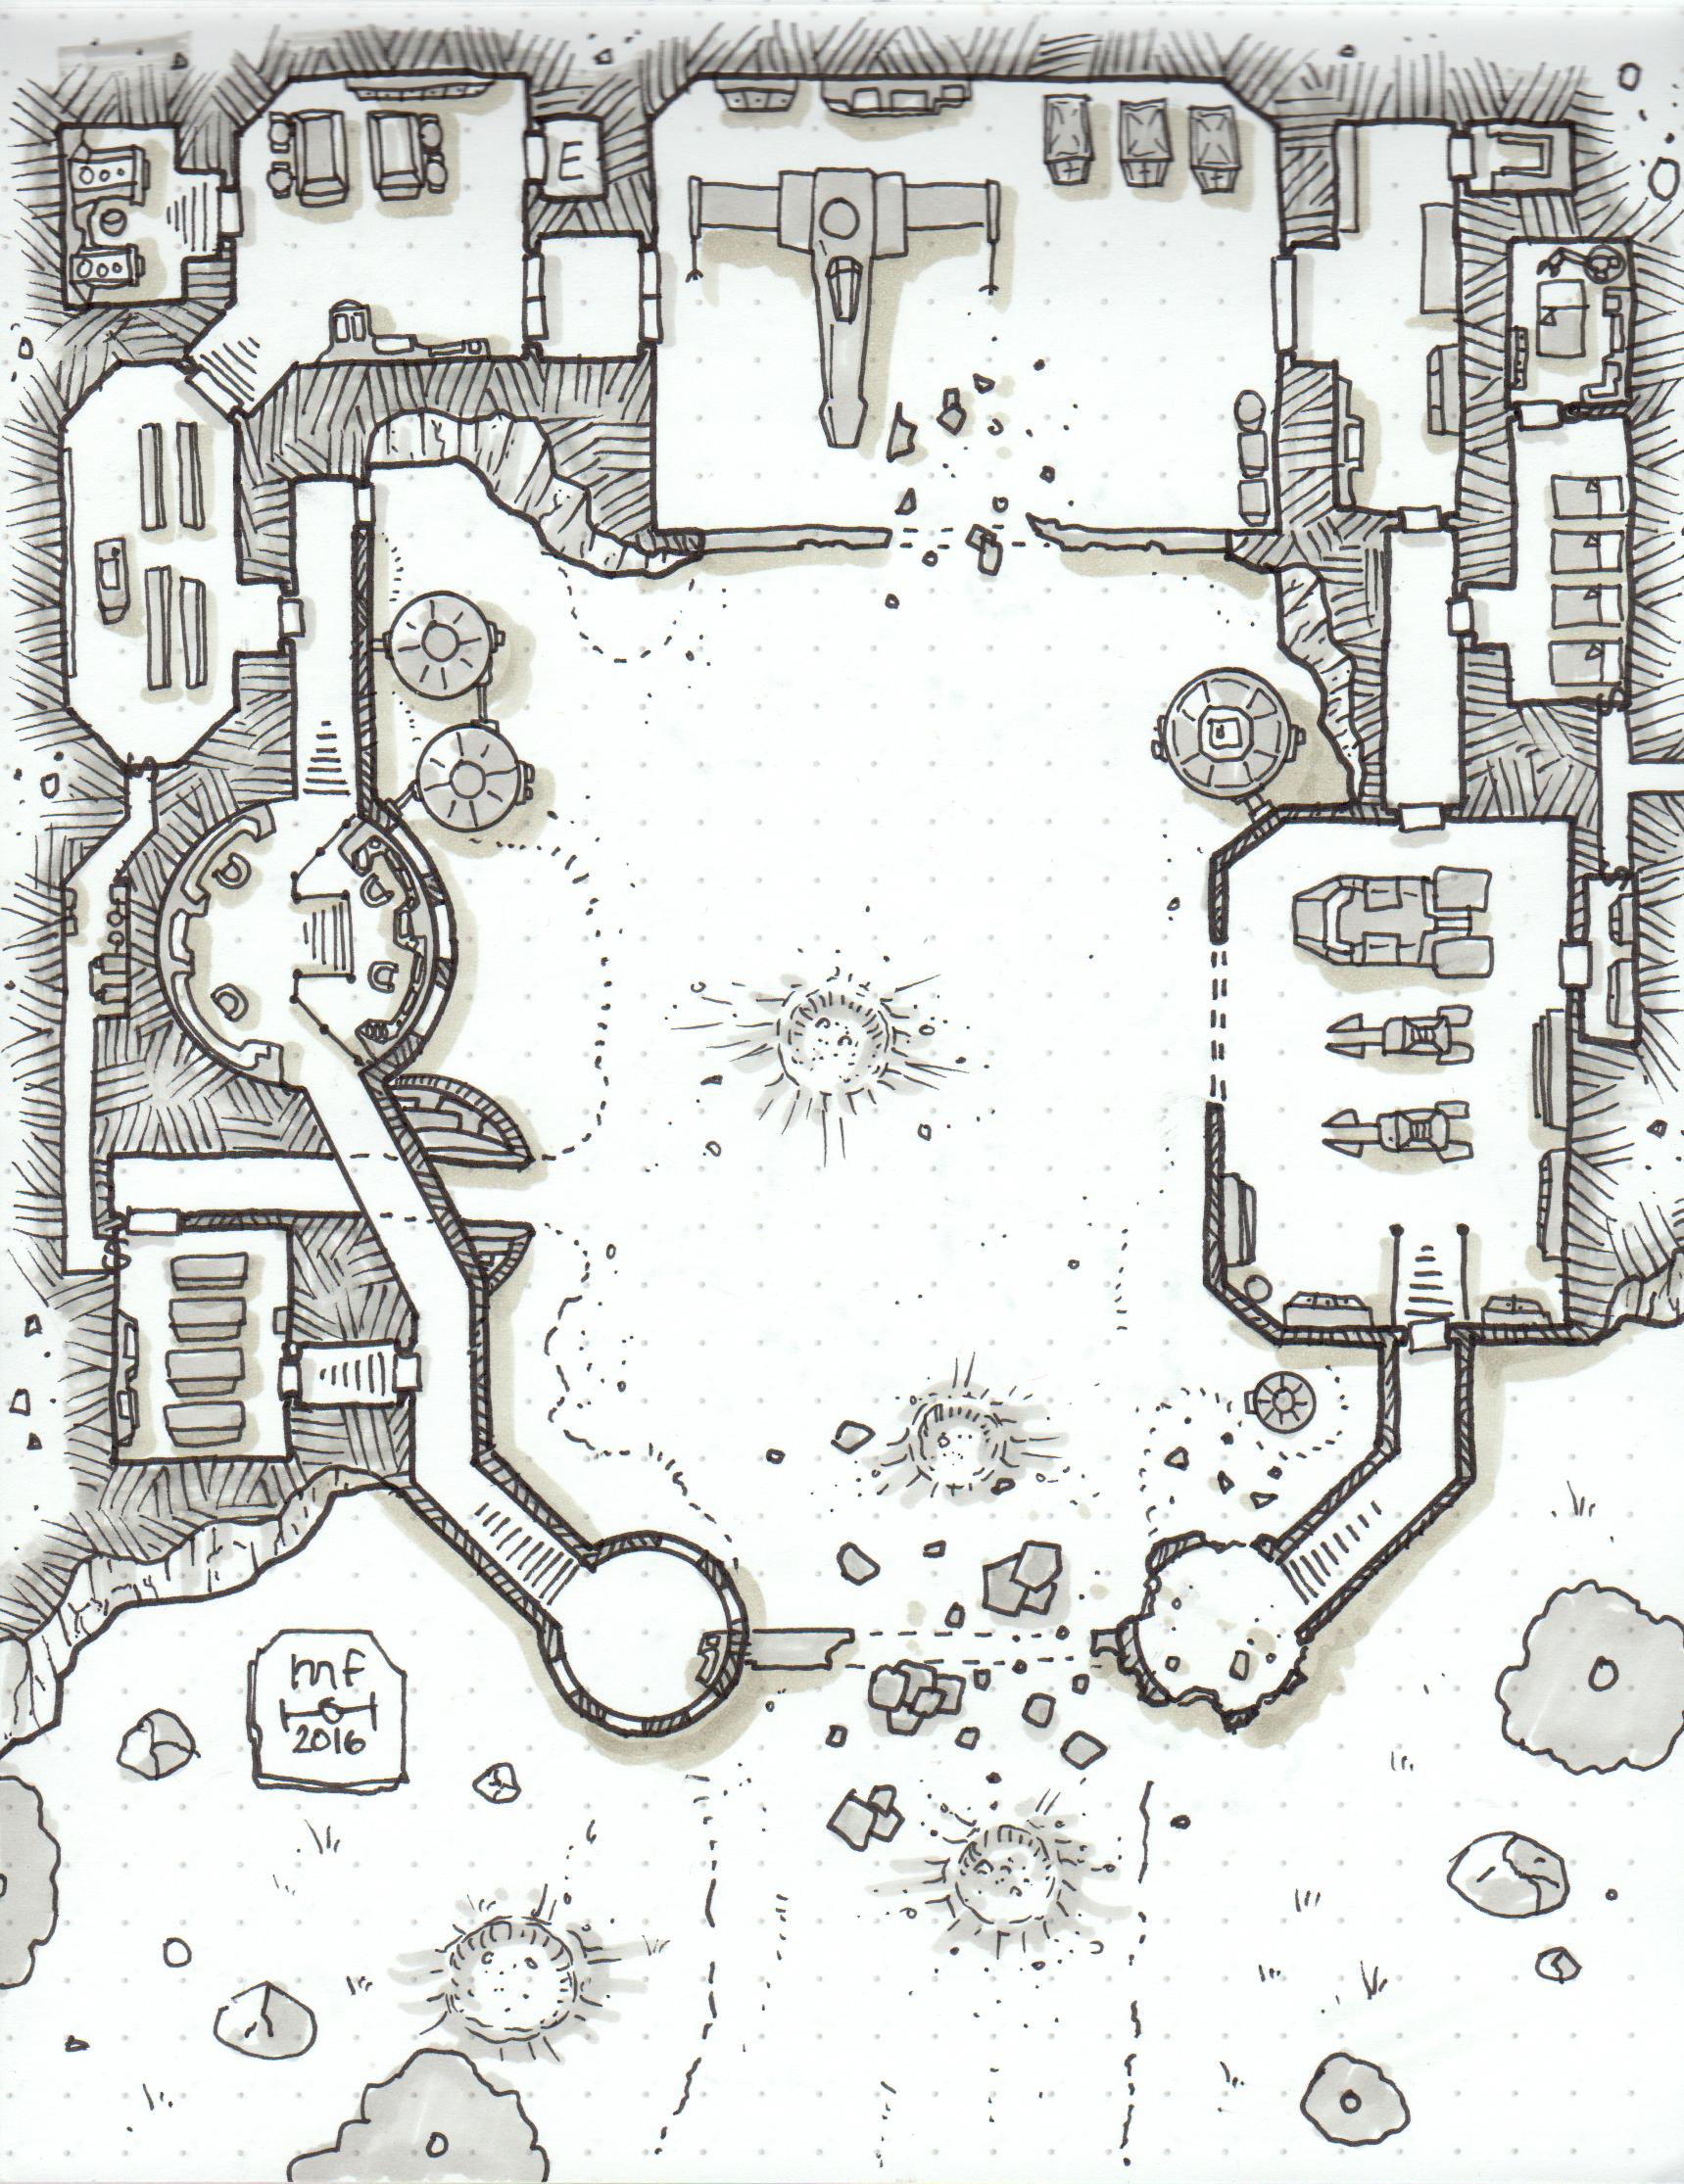 Space Station Deck Plans